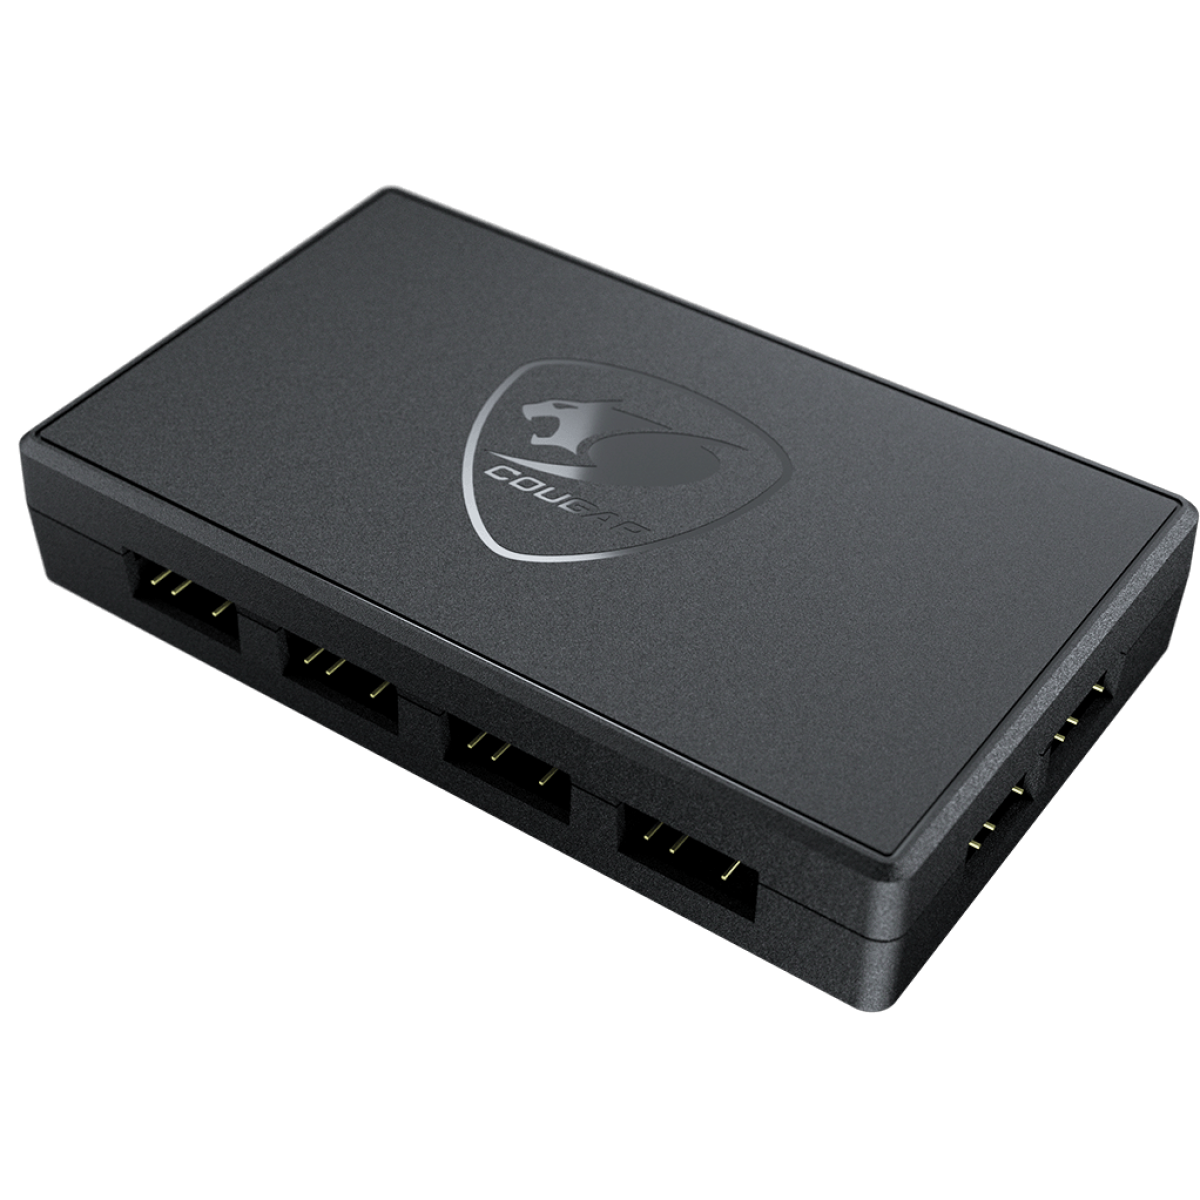 Controlador de Fan Cougar Core Box V3, PWM, ARGB, 3MCOBXV3.0001